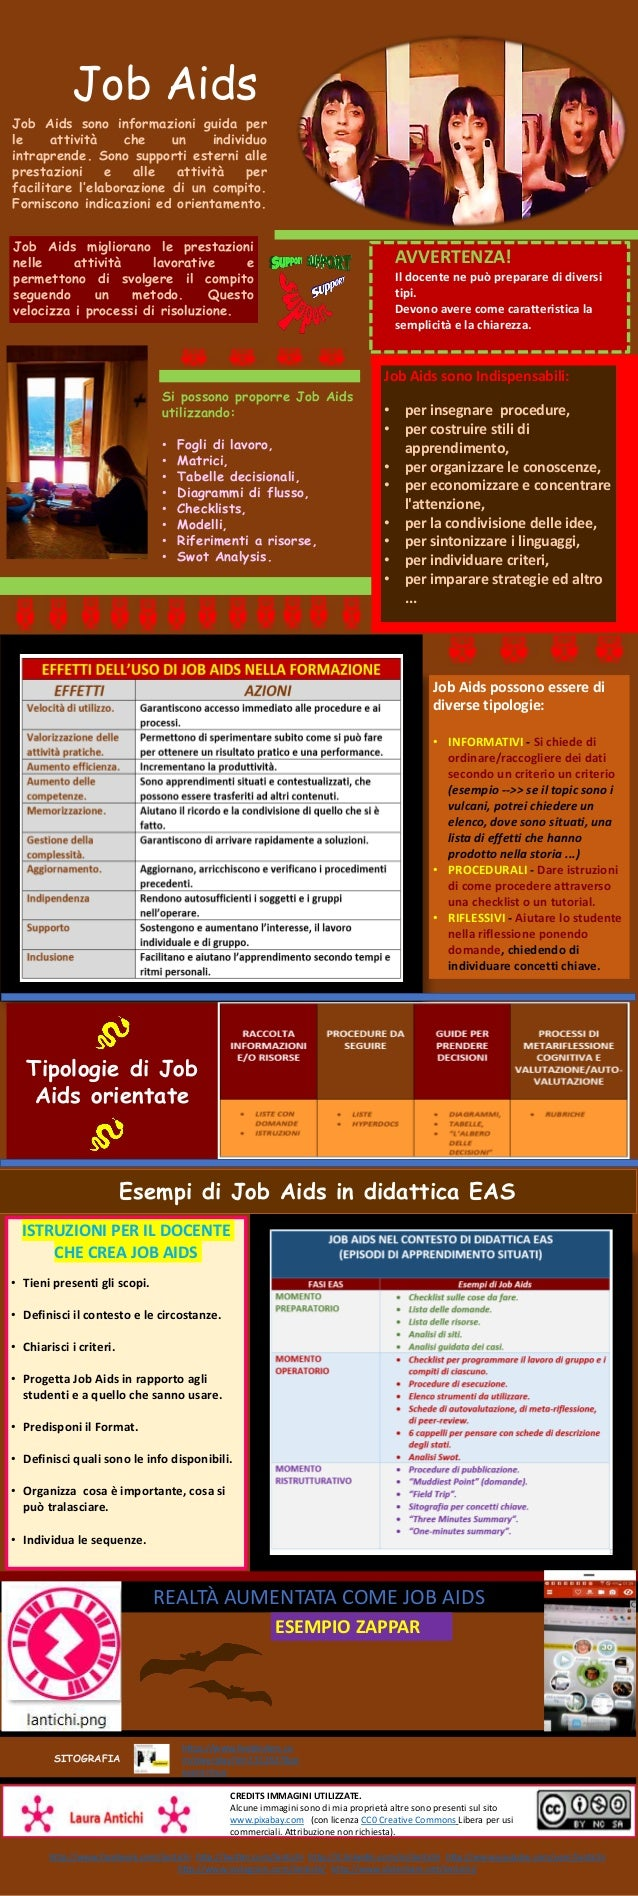 http://www.facebook.com/lantichi http://twitter.com/lantichi http://it.linkedin.com/in/lantichi http://www.youtube.com/use...